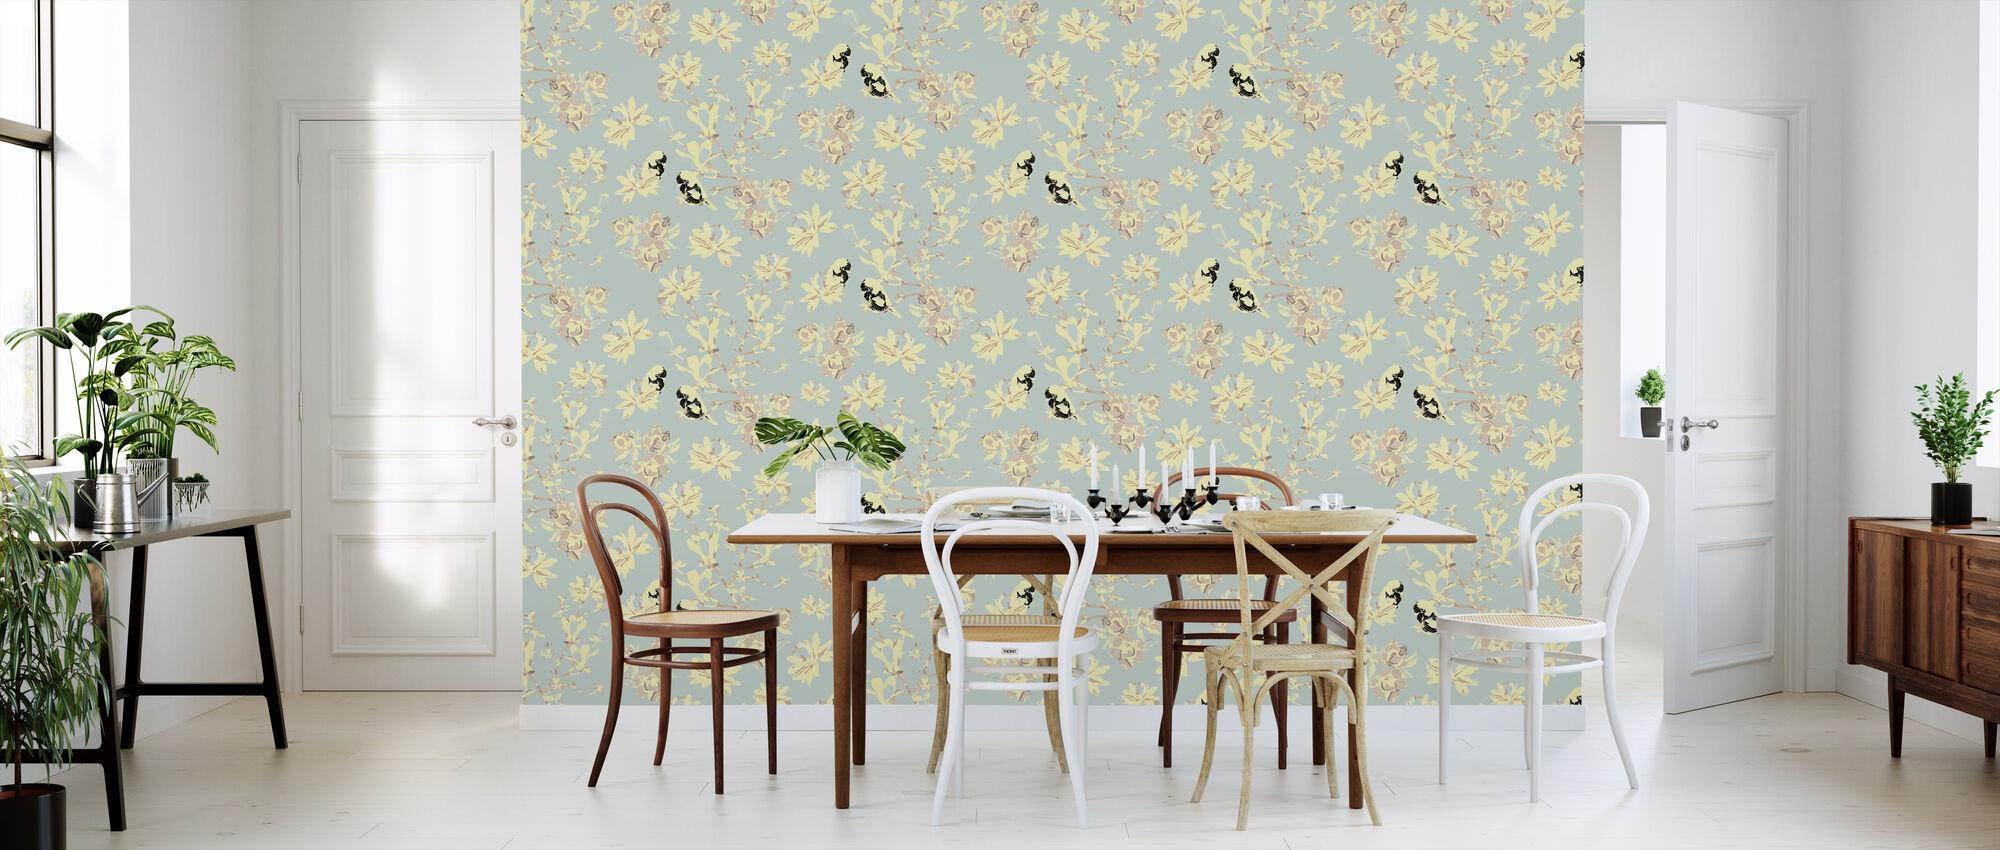 Mothers Magnolia Softish - Wallpaper - Kitchen